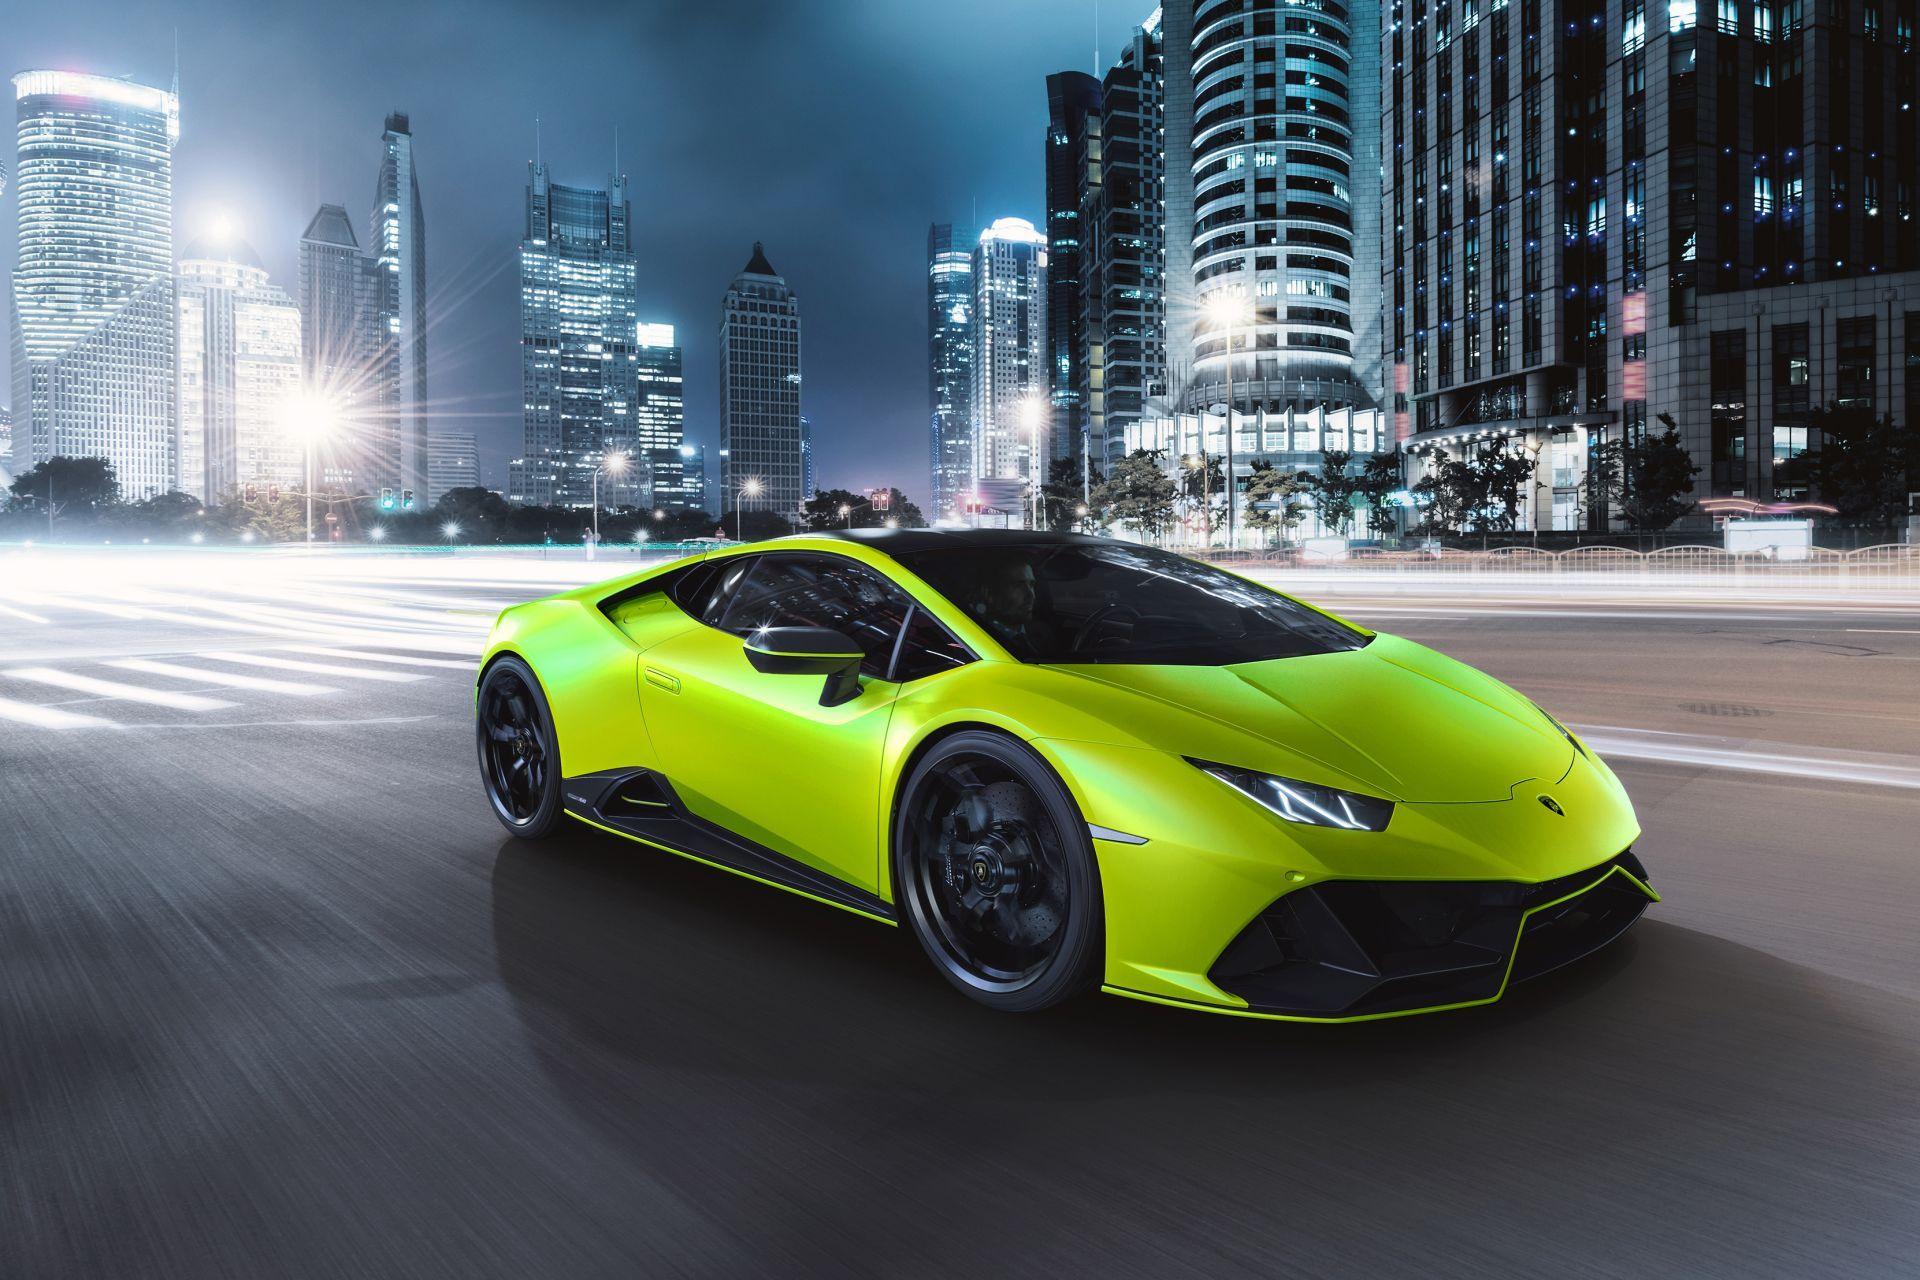 Lamborghini-Huracan-Evo-Fluo-Capsule-13